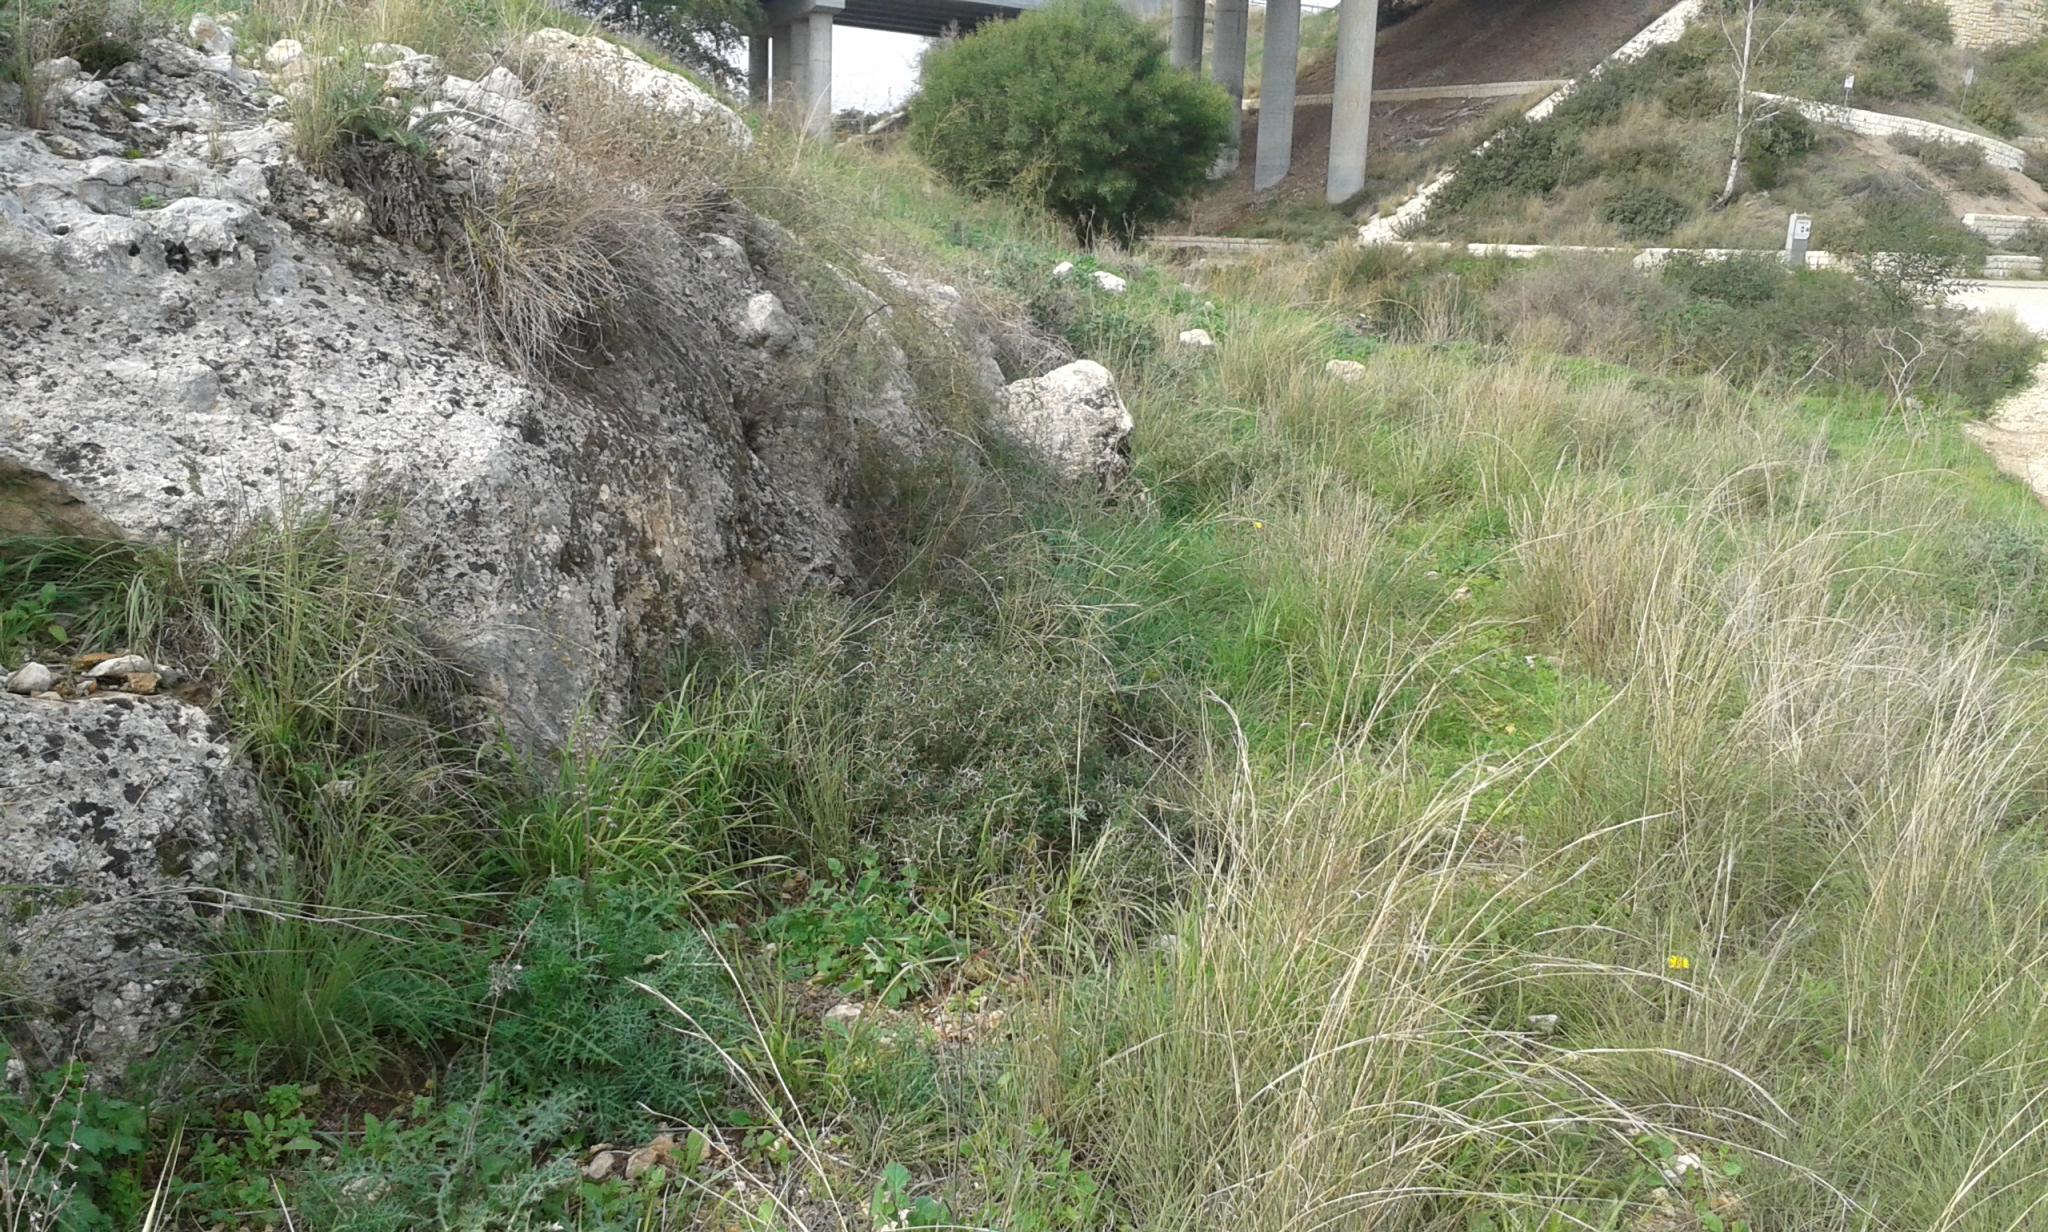 File The Train To A Luban Embarkment Toward The Bridge Under Road